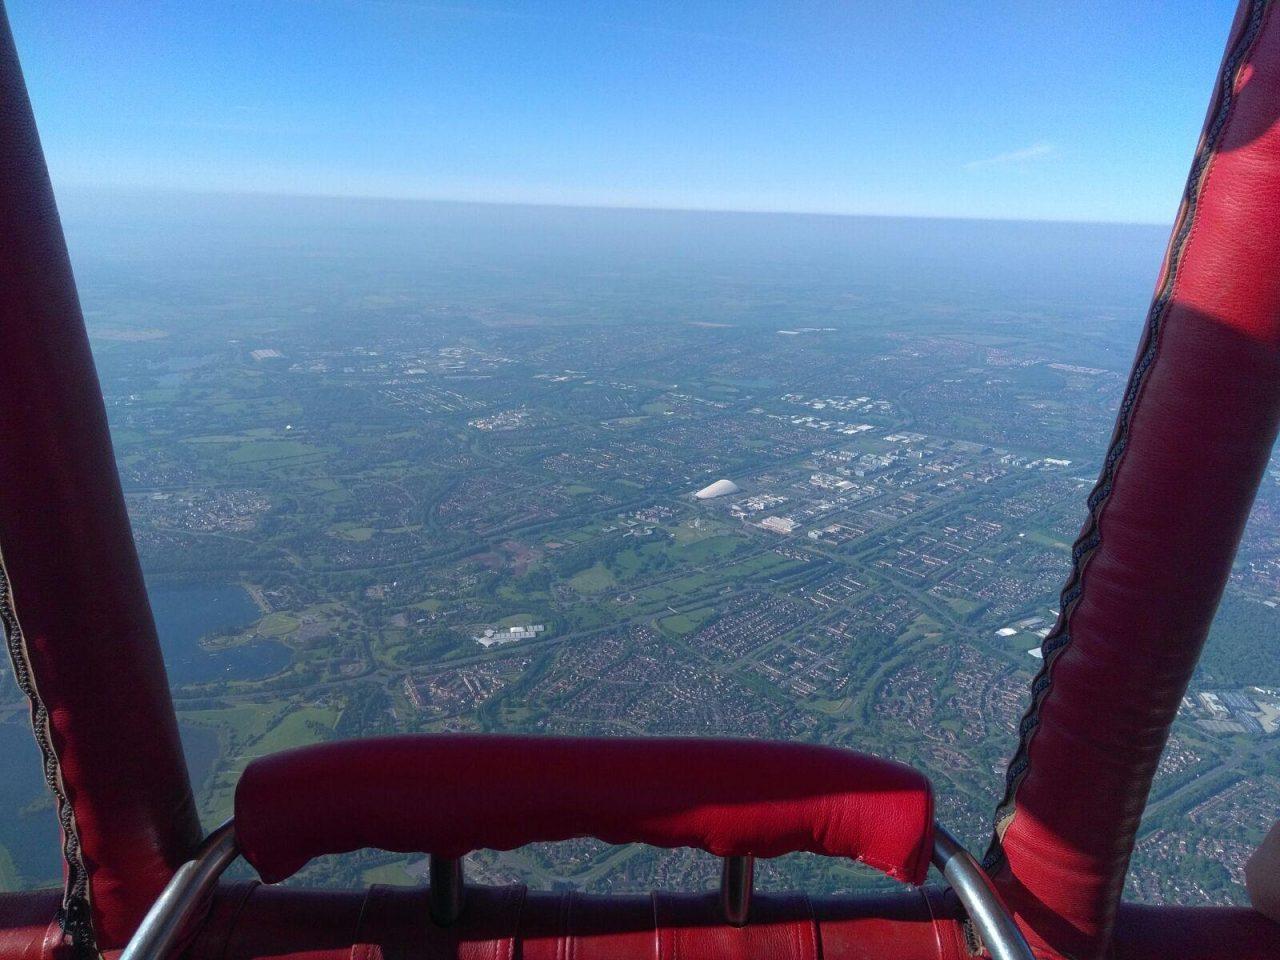 View from a Virgin hot air balloon